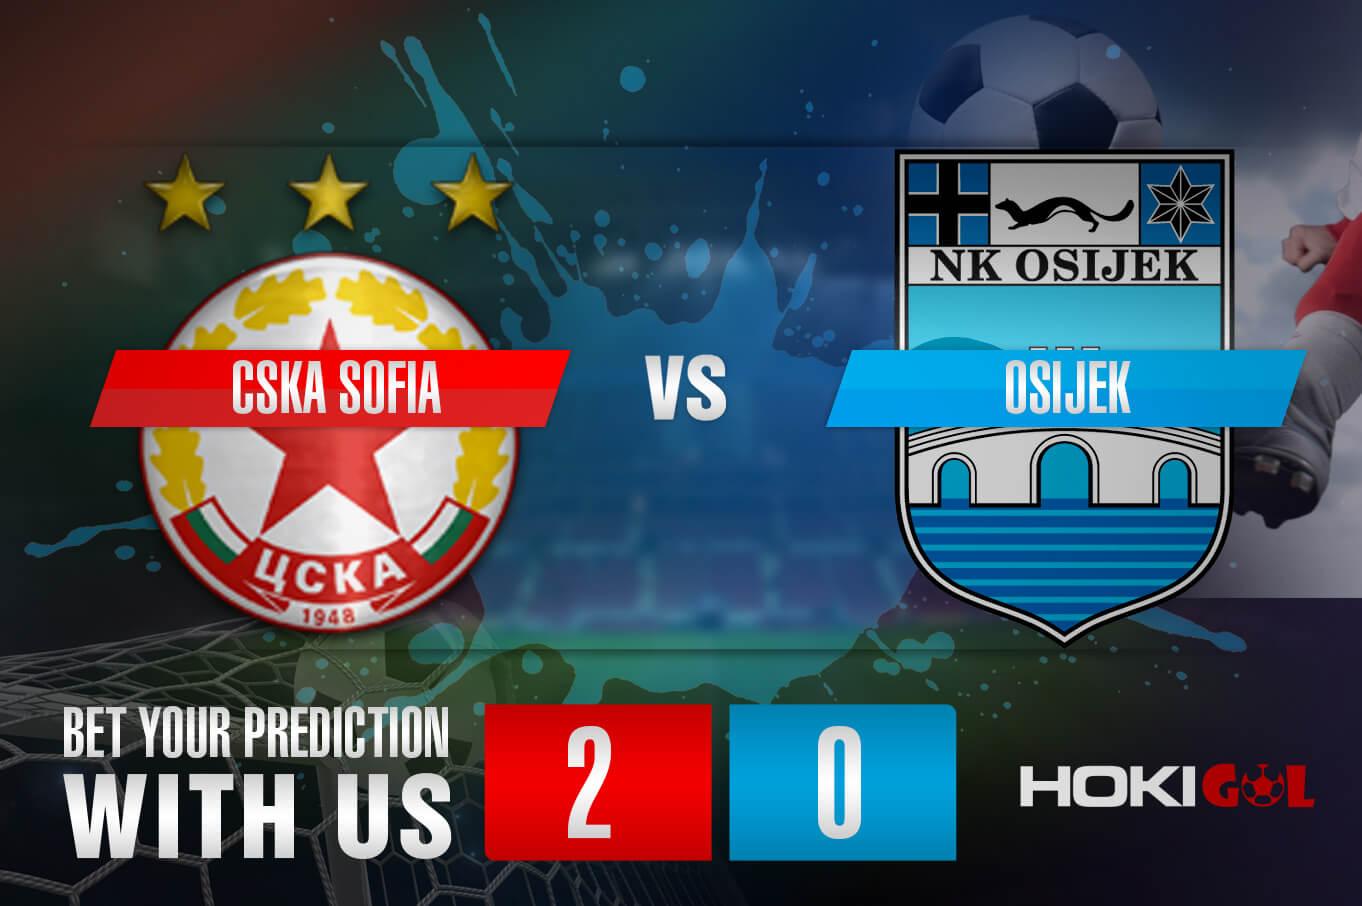 Prediksi Bola CSKA Sofia Vs Osijek 6 Agustus 2021